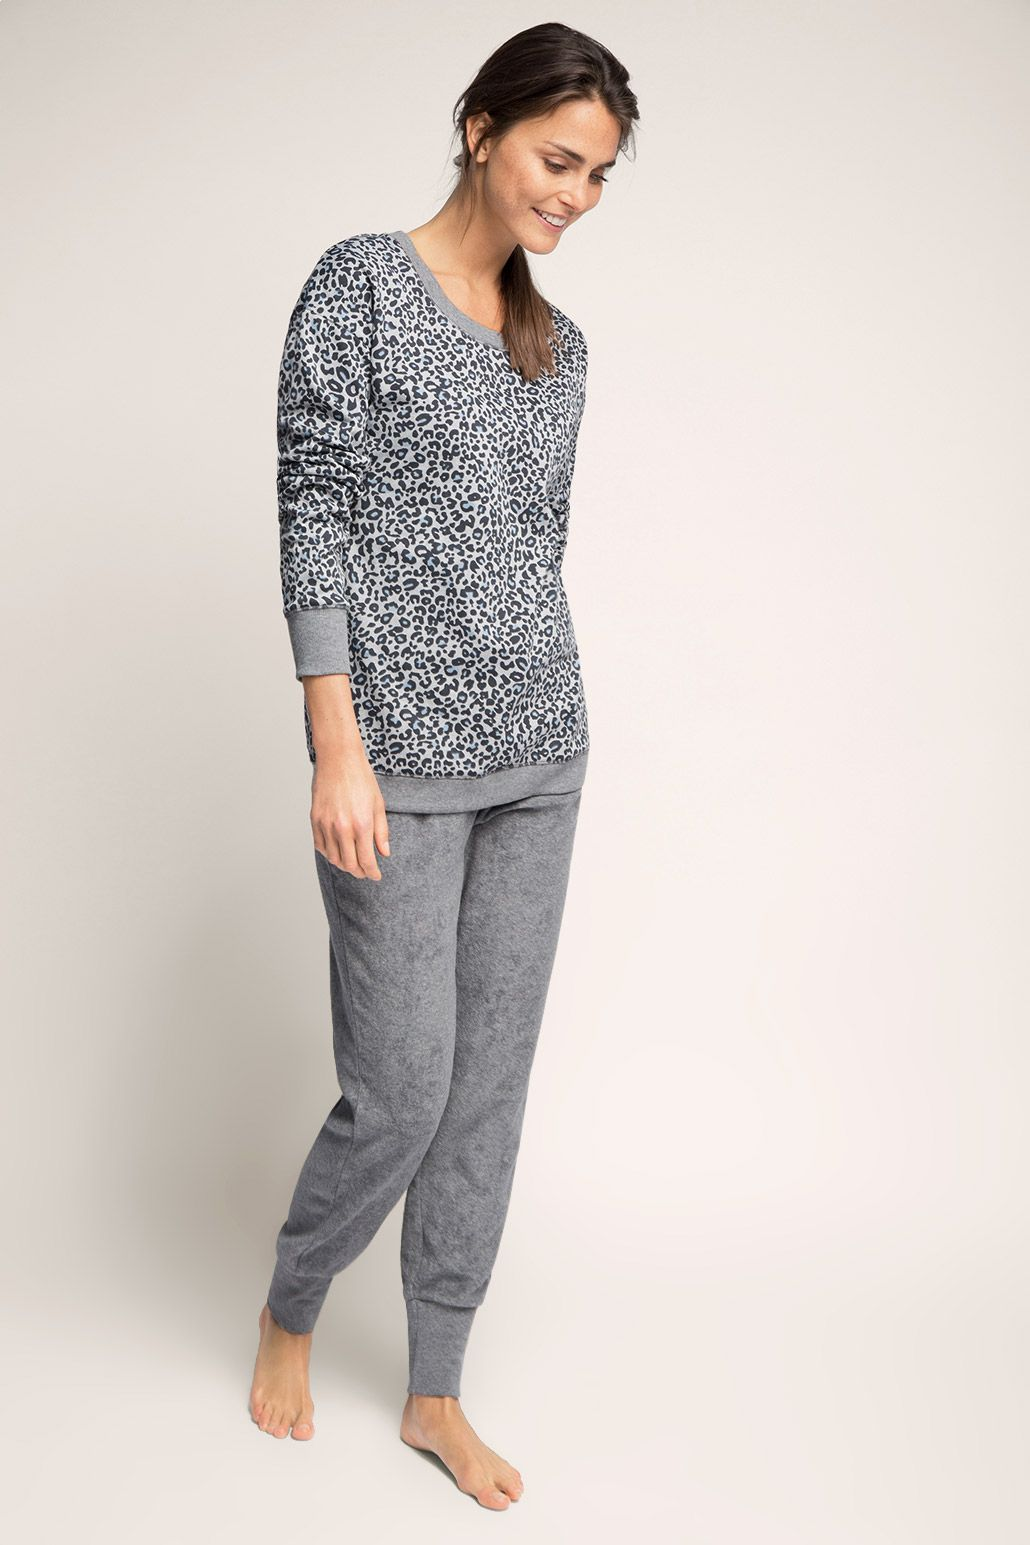 8ff5964a Esprit - jersey/towelling pyjamas at our Online Shop | Homewear ...